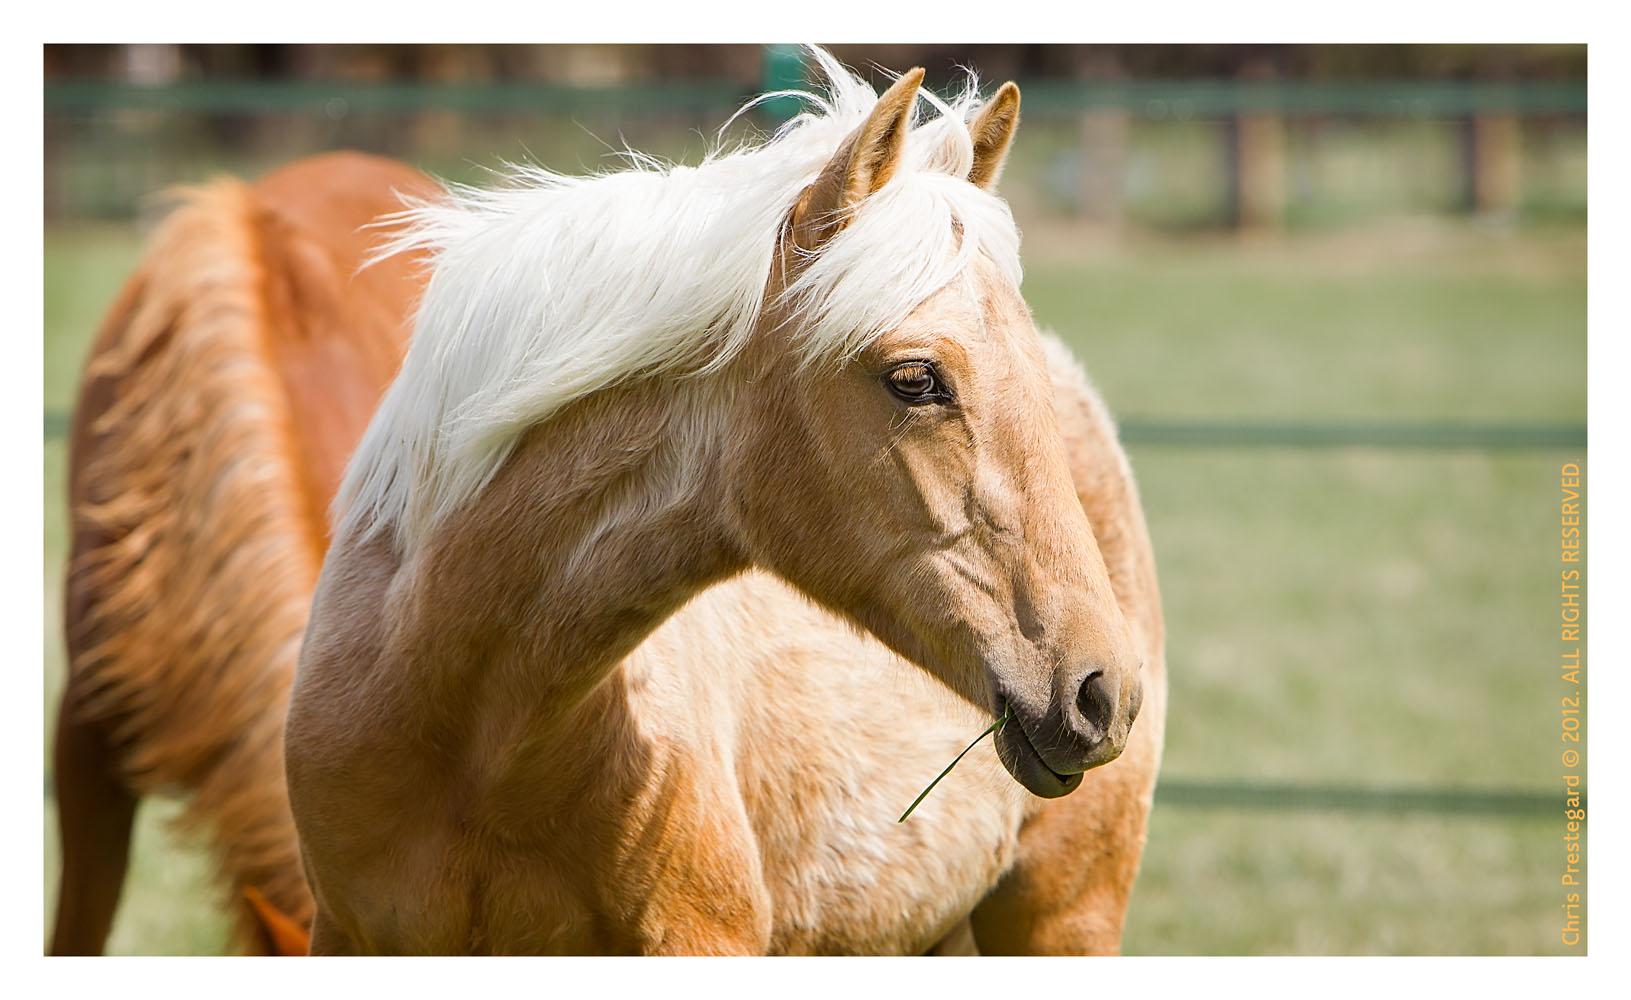 Horse3118-Feb13-2012